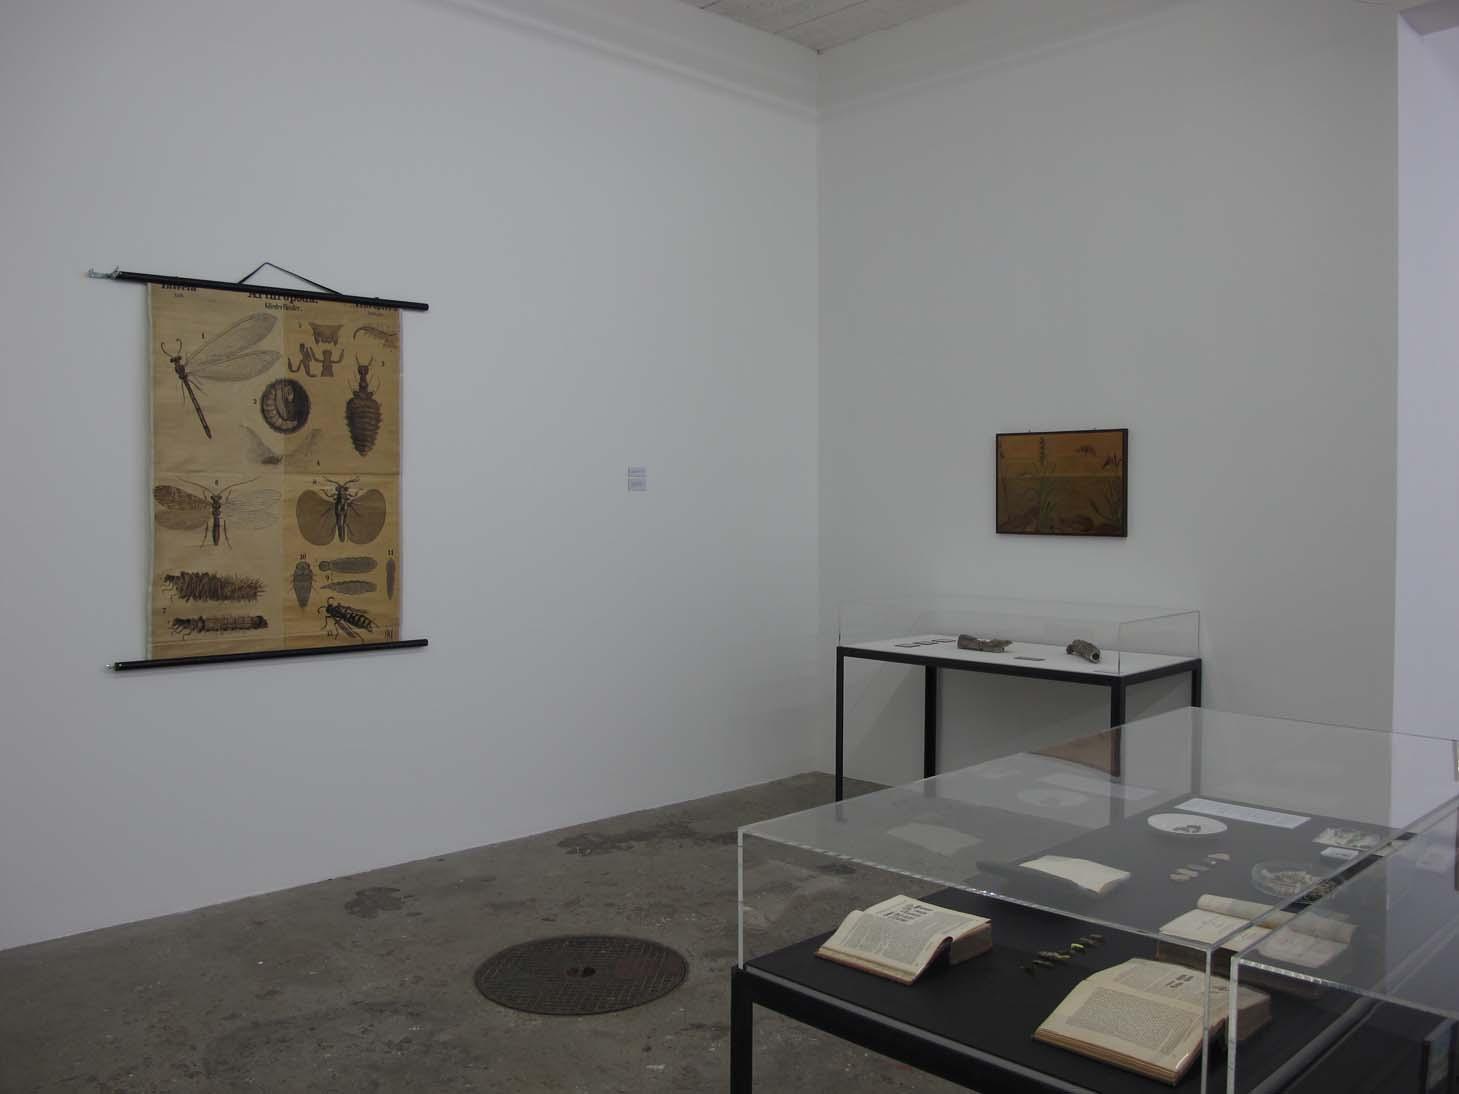 Un coin de l'exposition